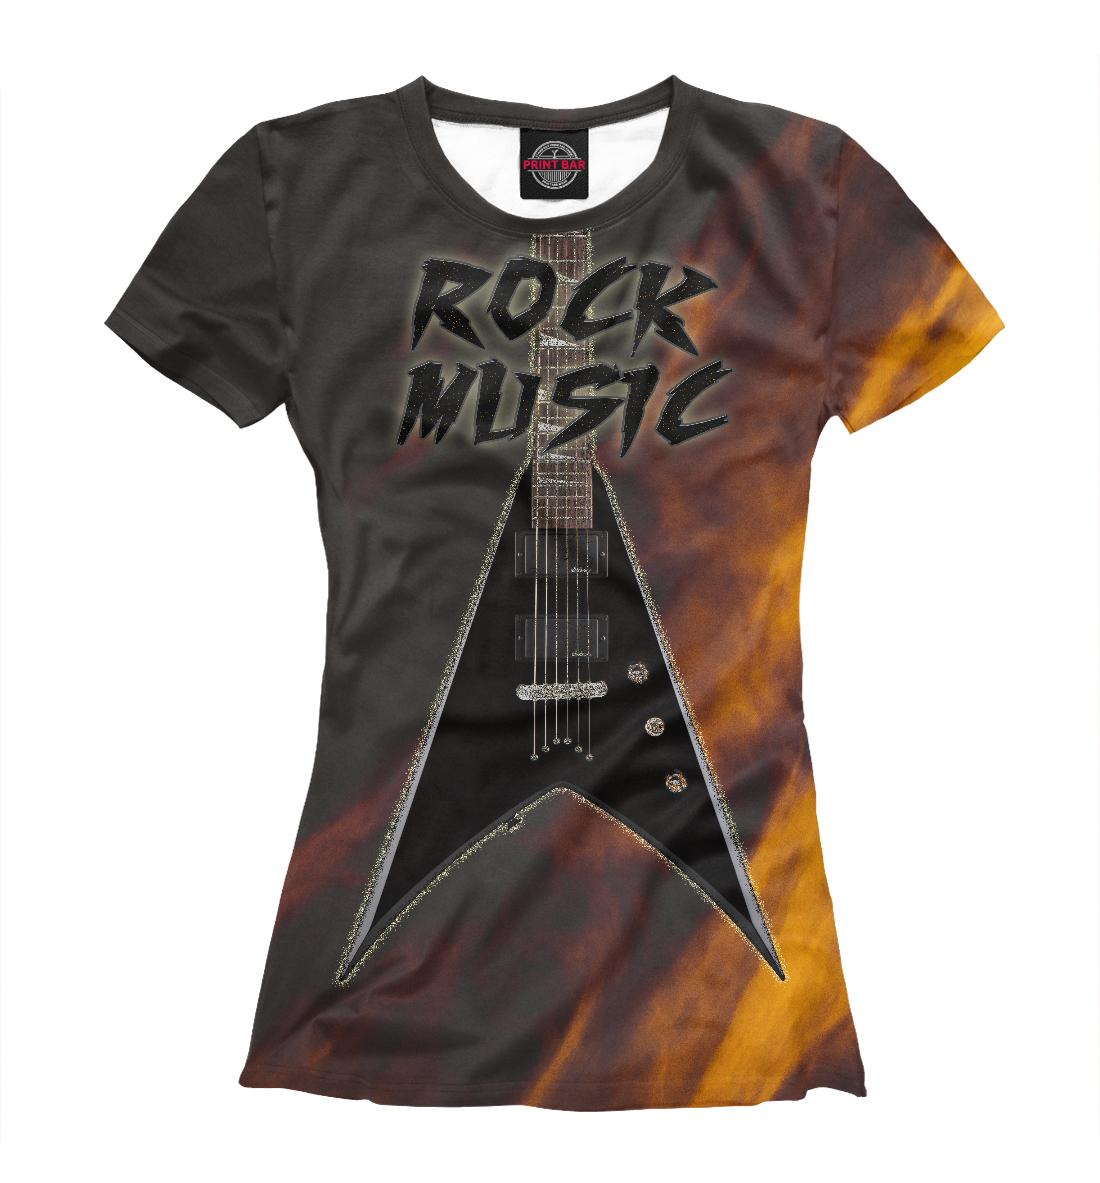 Рок гитара/рок музыка рок музыка